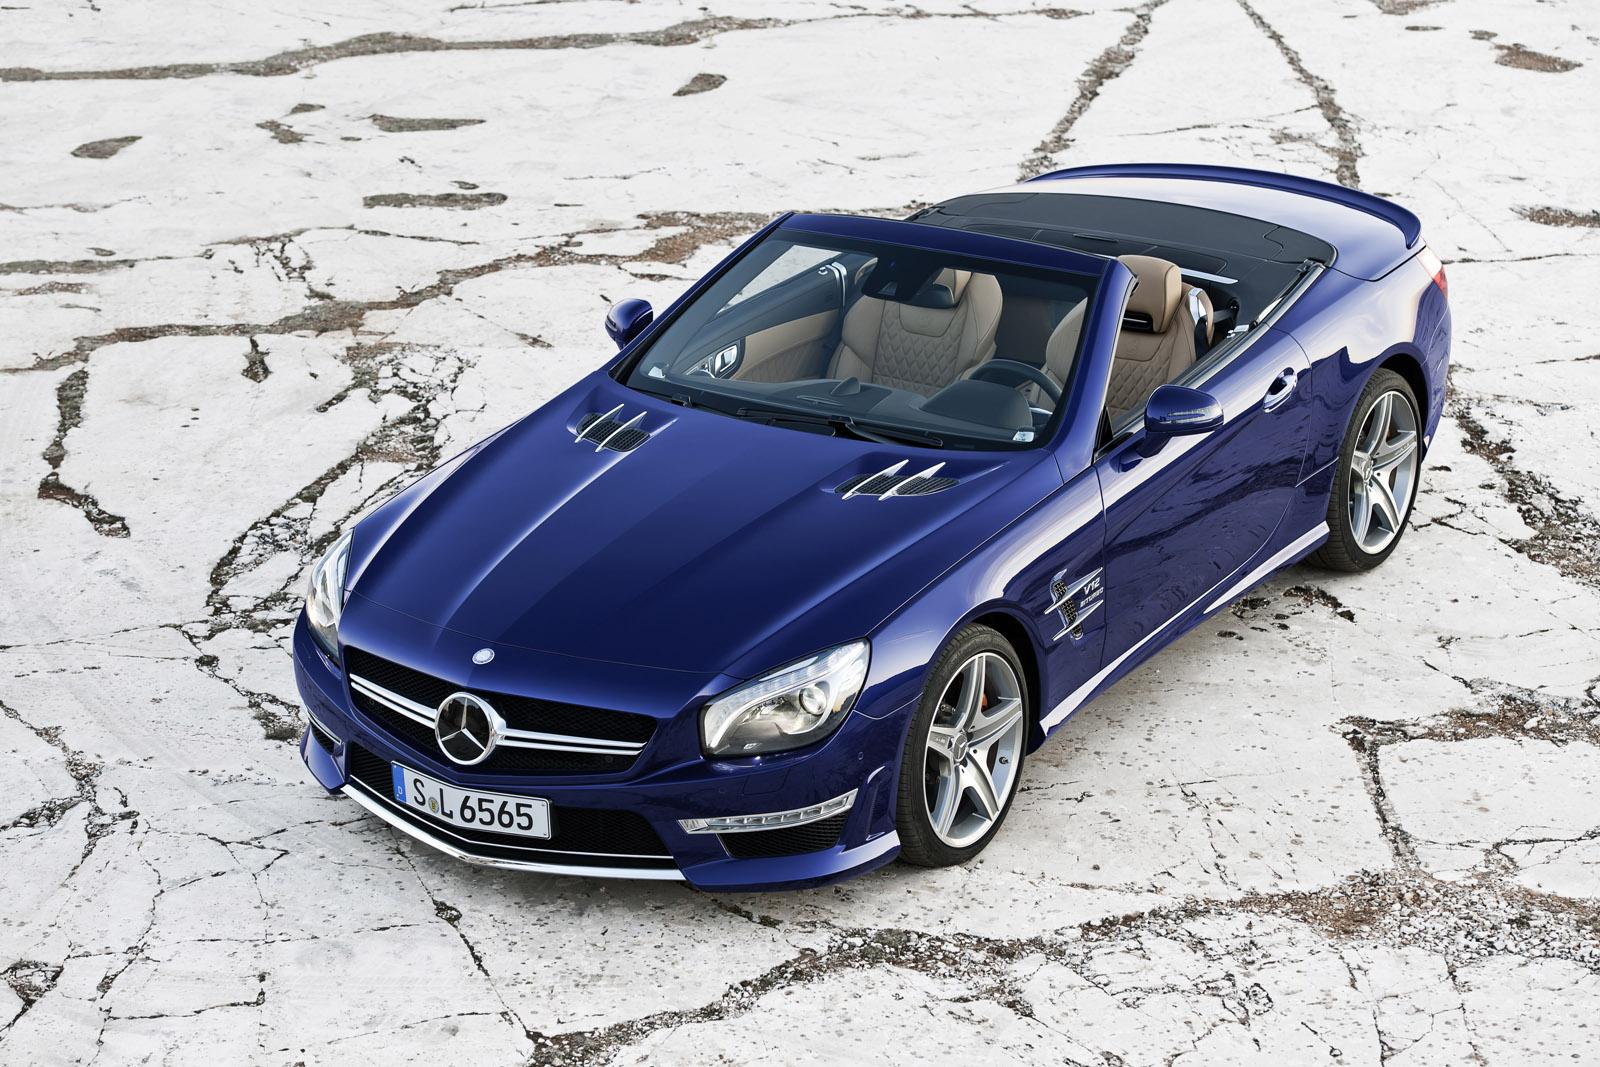 http://2.bp.blogspot.com/-CoG9477ImjY/T-N3Mbxi74I/AAAAAAAAD0U/0pc4d18PRyM/s1600/Mercedes-Benz+SL65+AMG+Hd+Wallpapers+2013_1.jpg